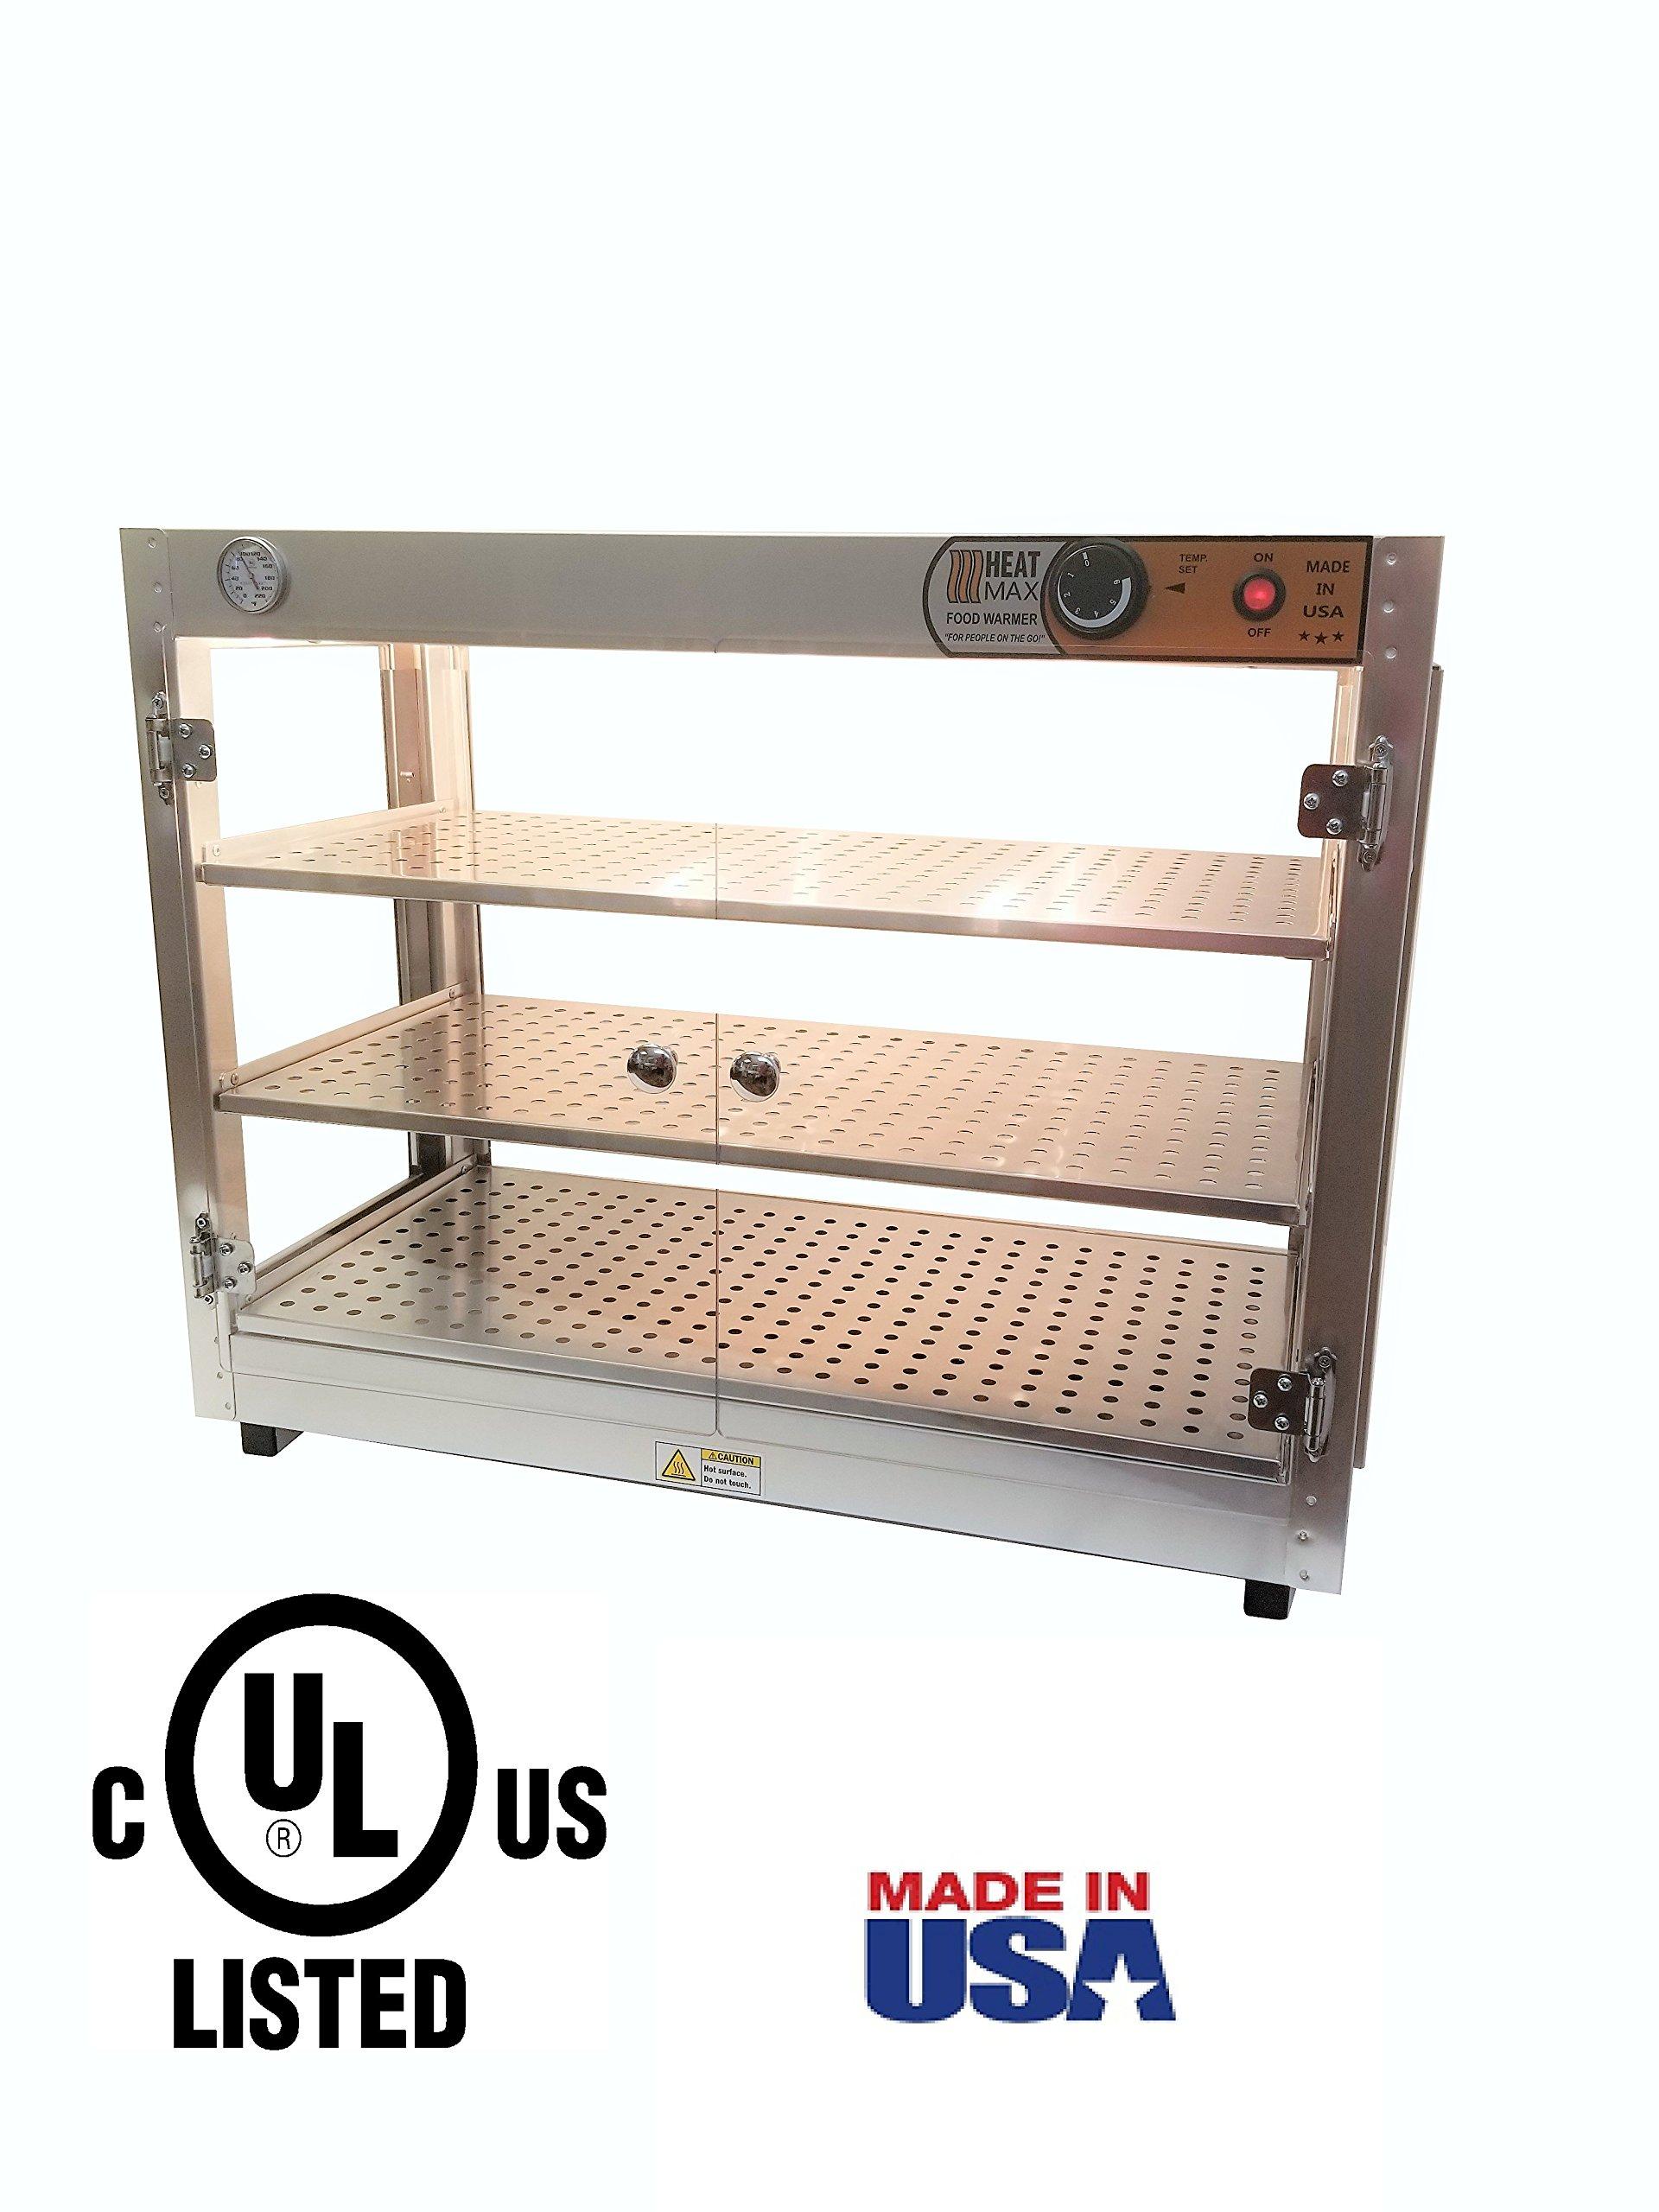 Heatmax 30x15x24 Commercial Food Warmer Merchandiser Display Case, Patty, Pastry, Pizza Warmer